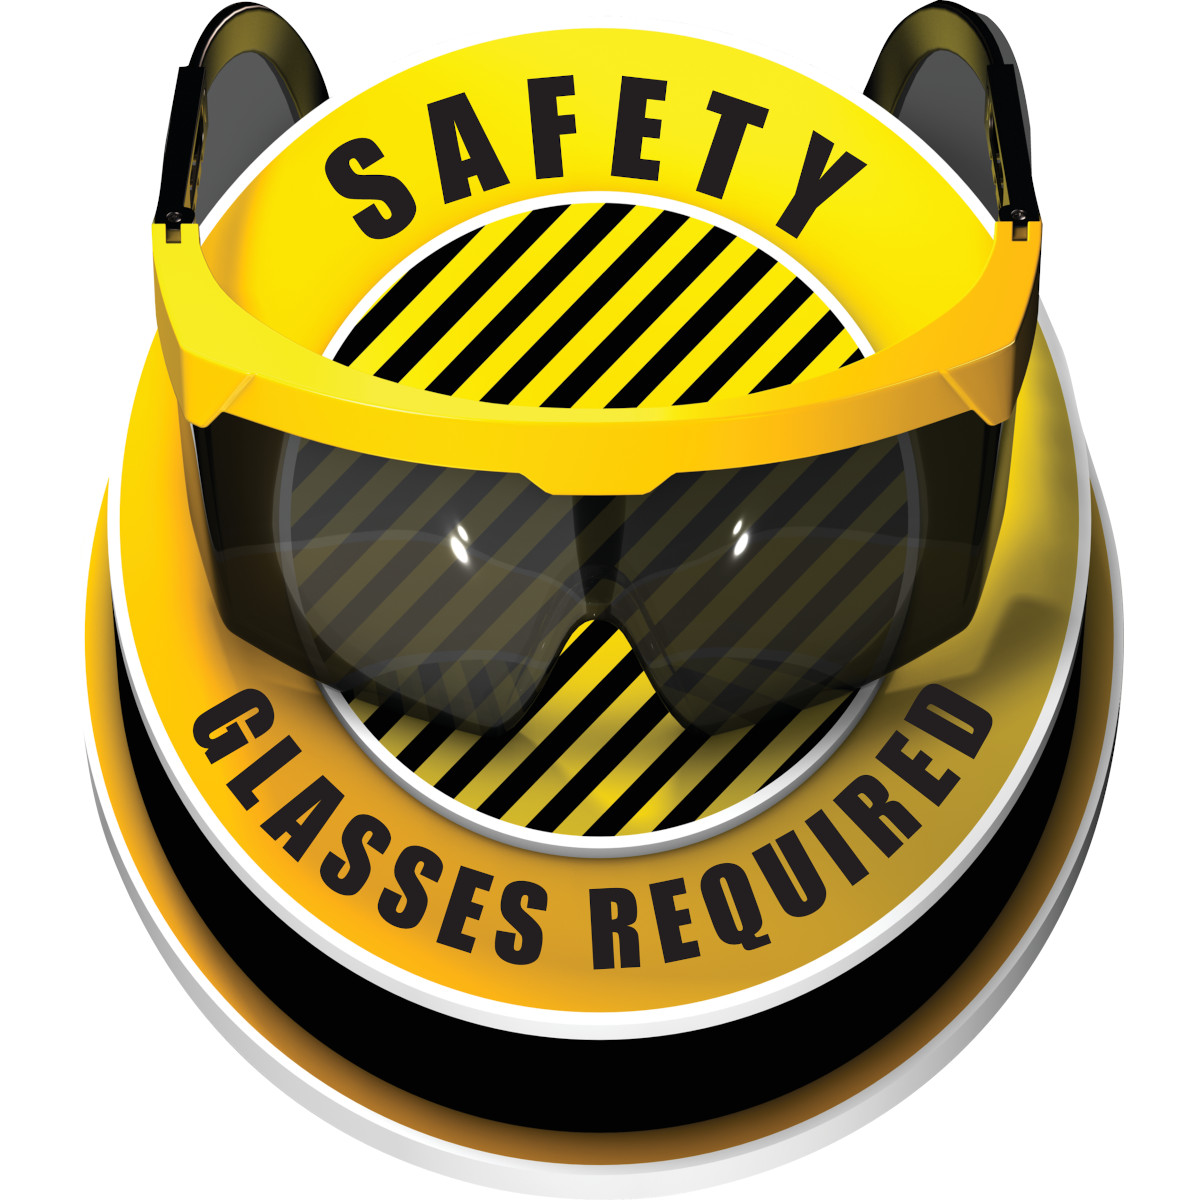 Safety Glasses Required 3d Floor Sign Brady Part 150167 Brady Bradyid Com